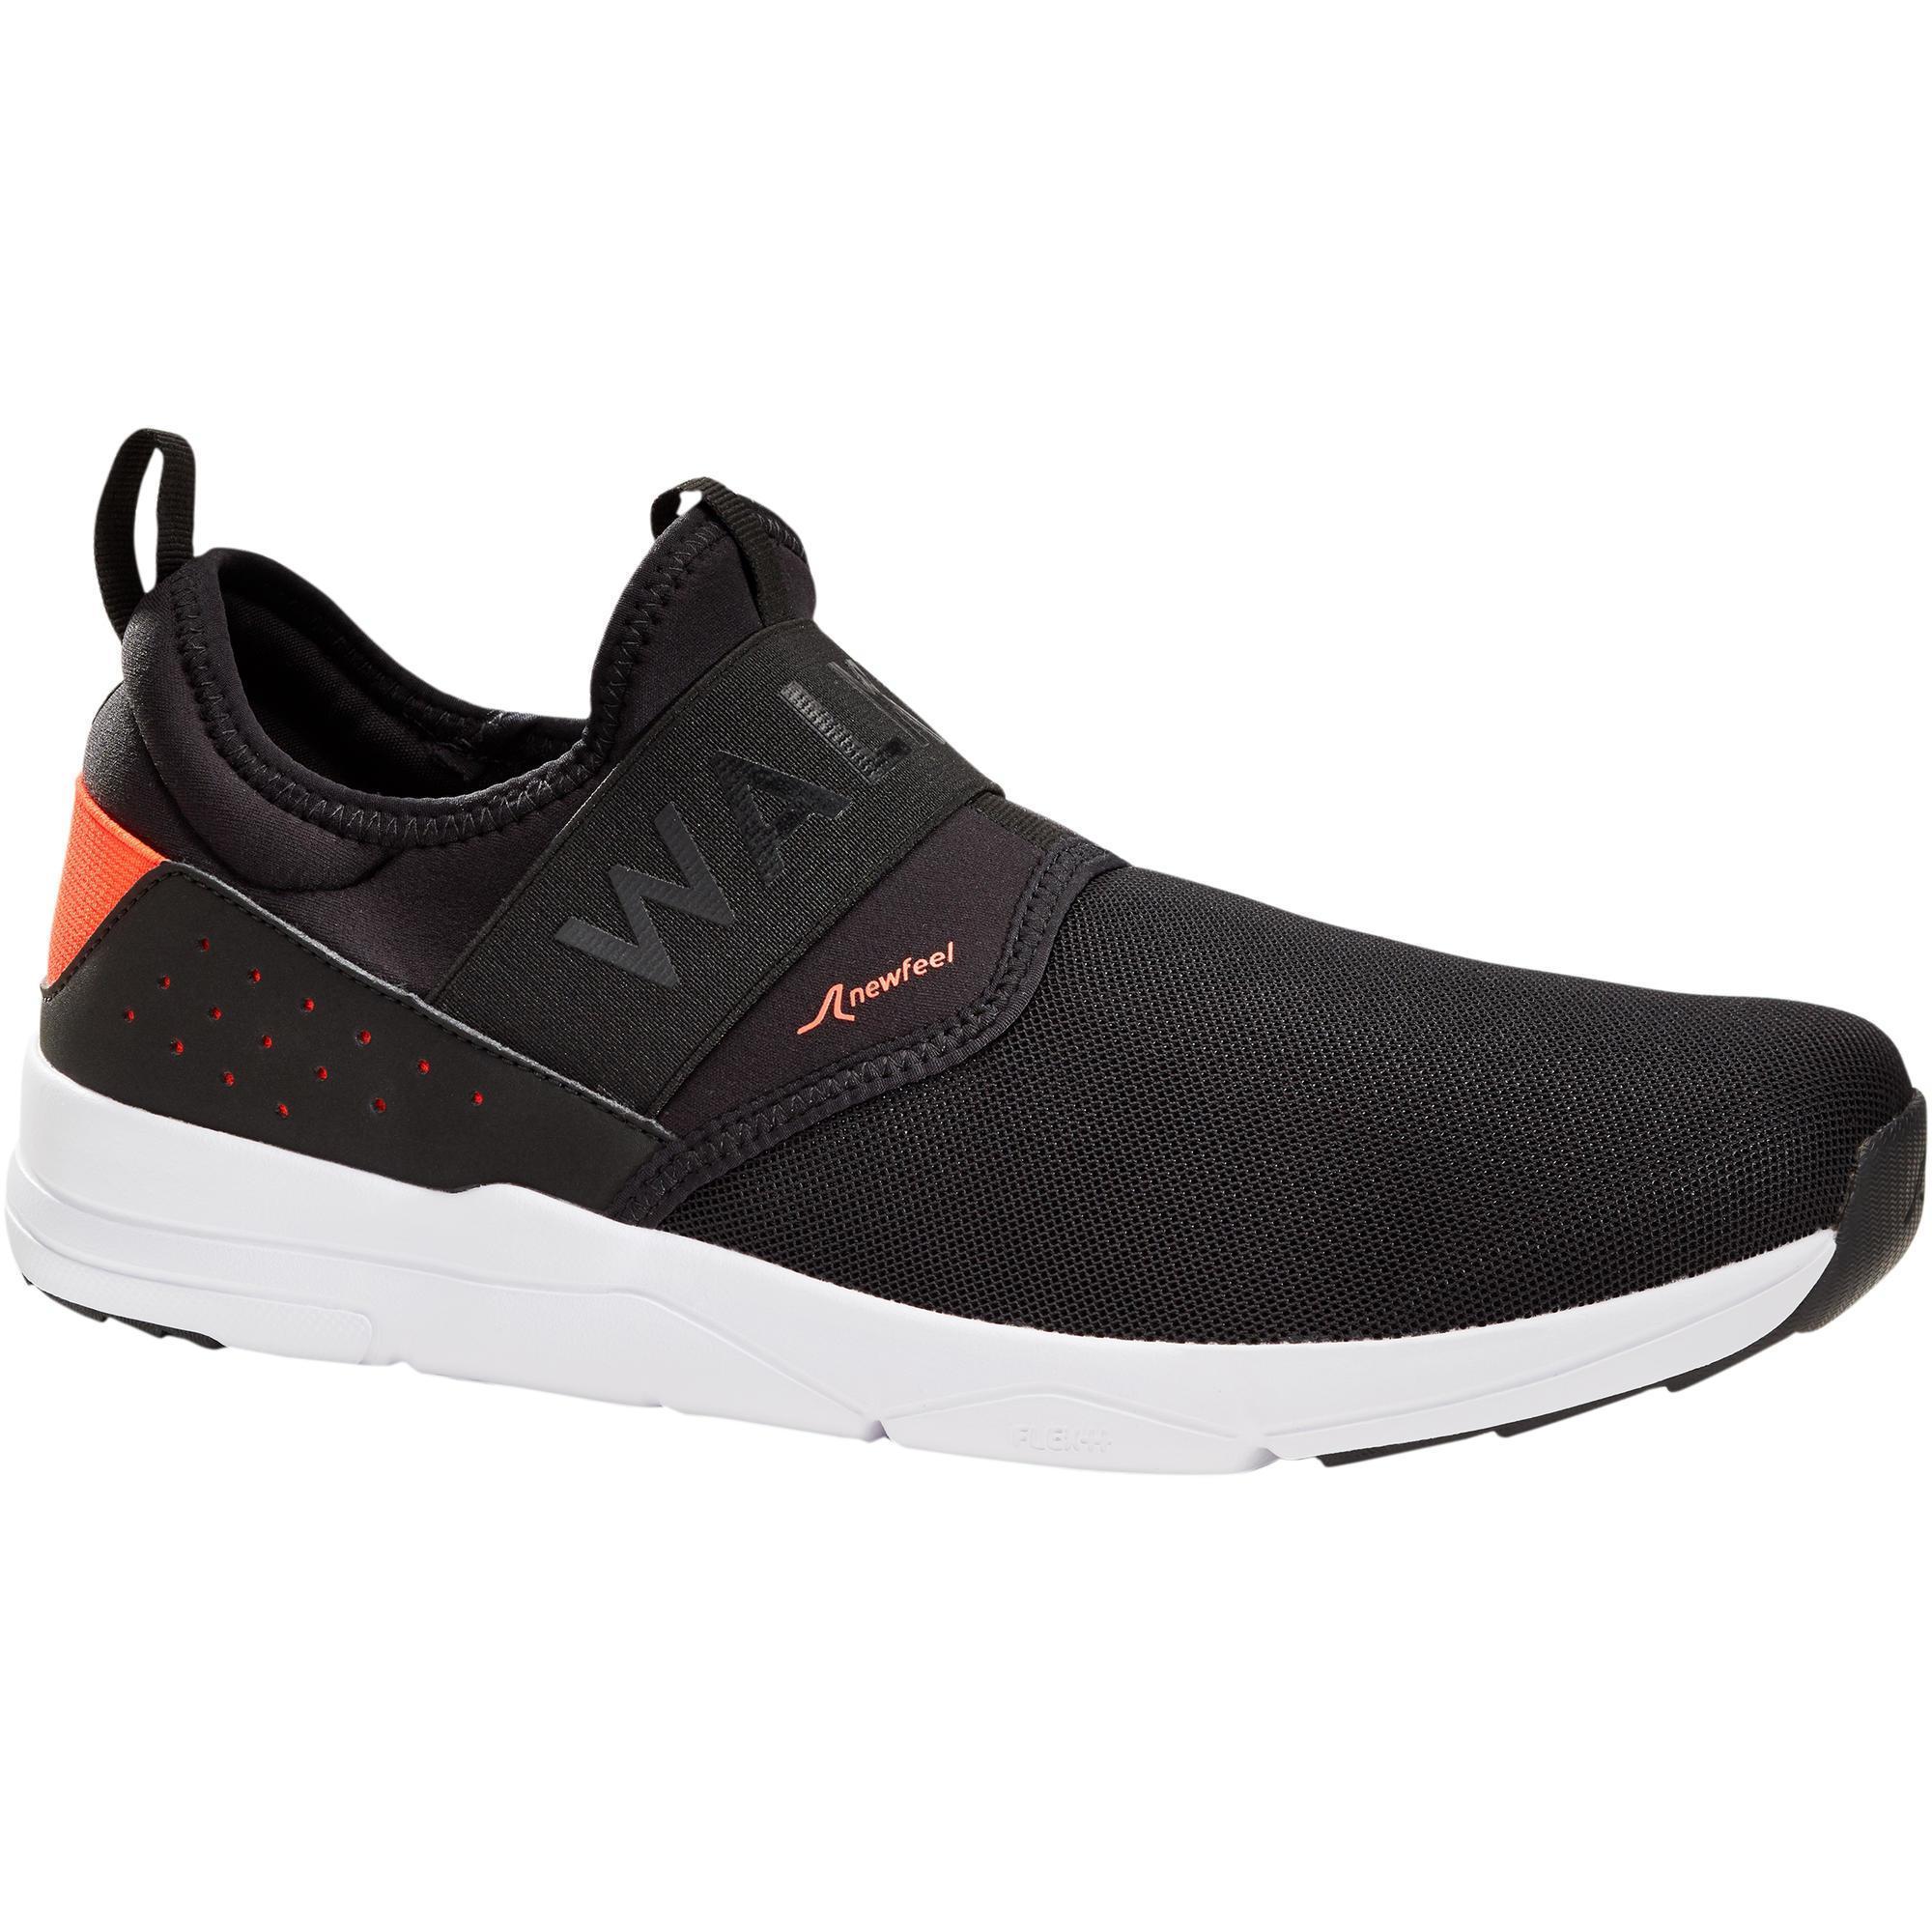 5ad1dccf2e Comprar Zapatillas de Marcha Hombre Online